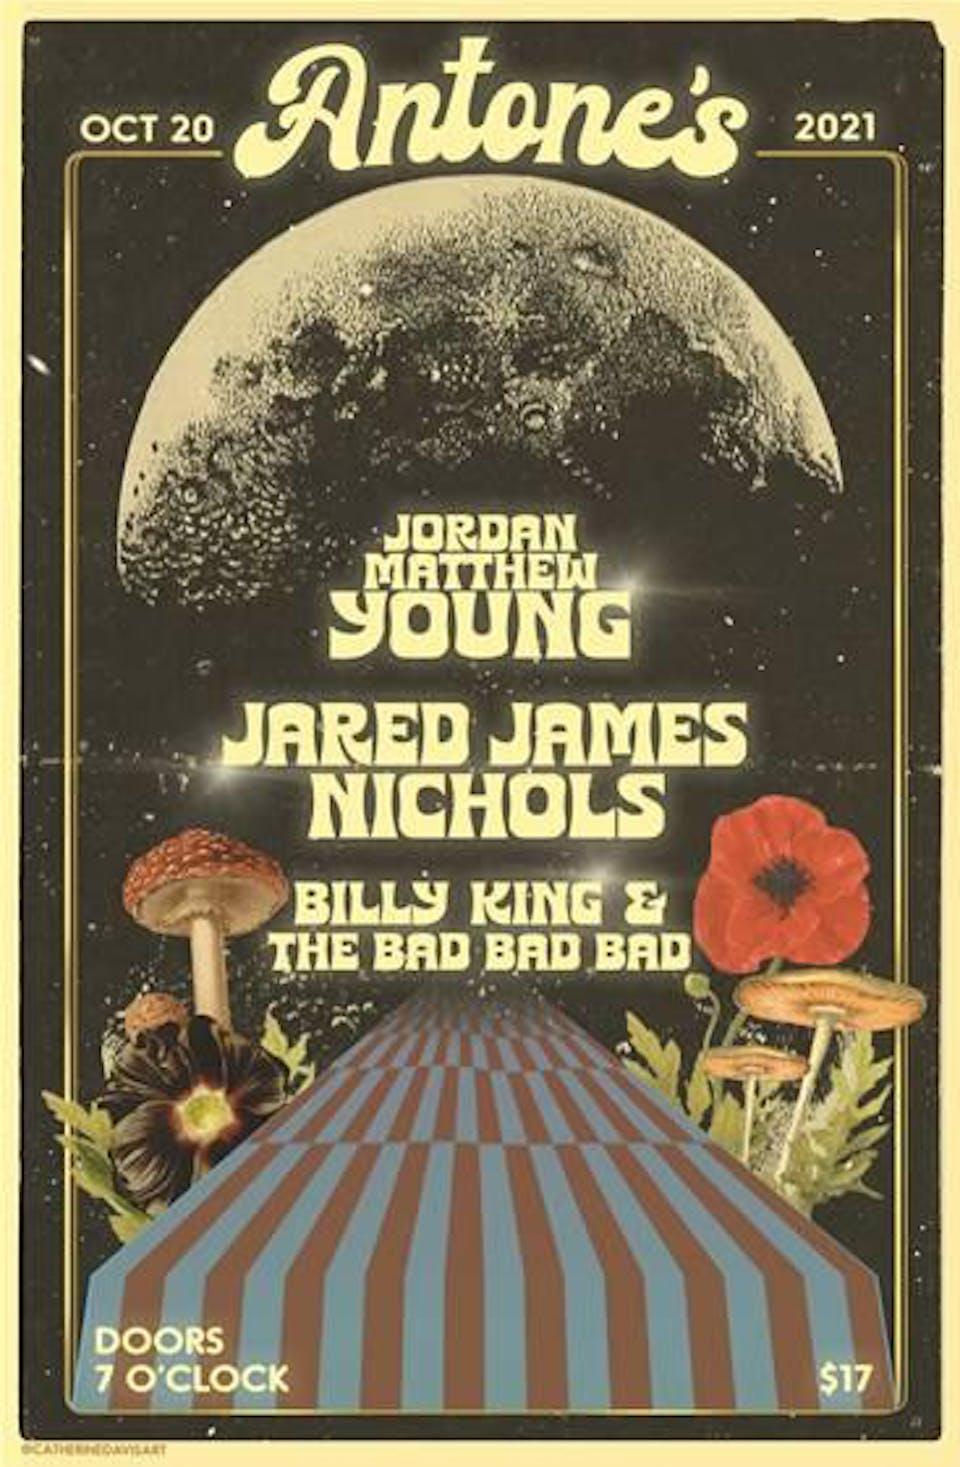 Jordan Matthew Young w/ Jared James Nichols & Billy King & the Bad Bad Bad